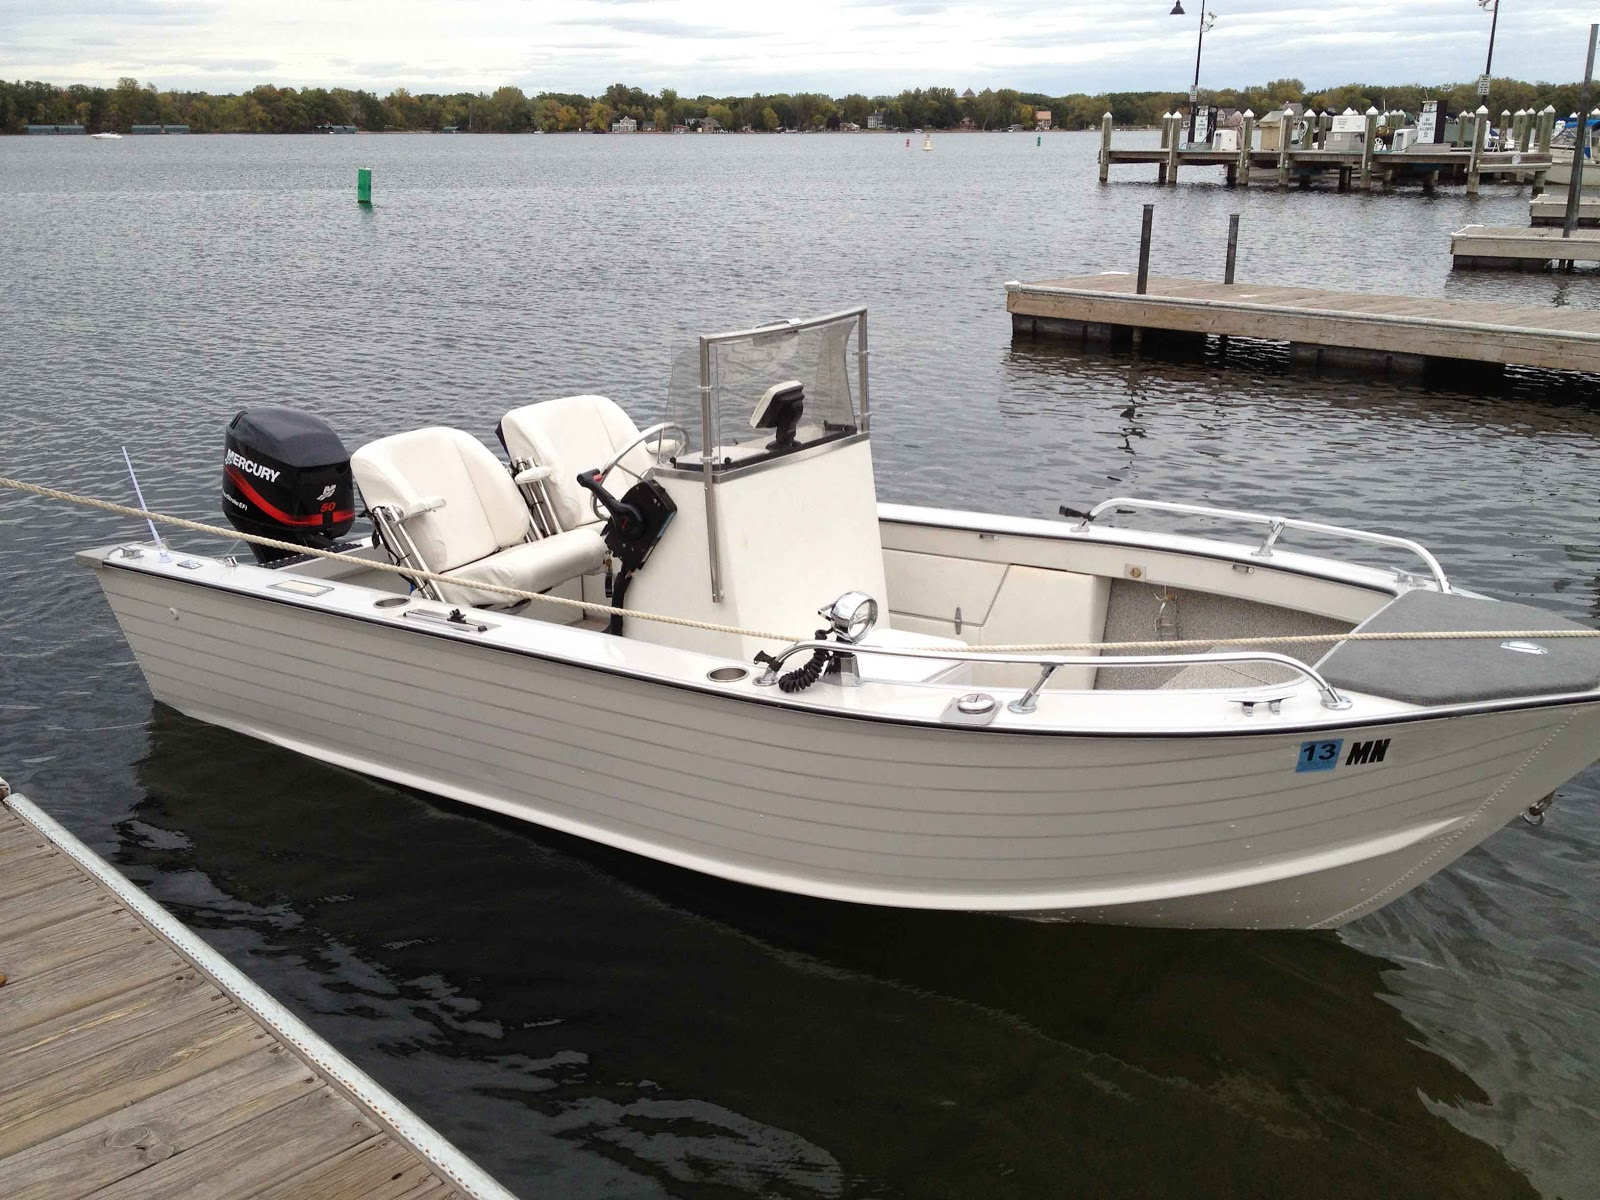 THE GULF Das Blue Fin Boat - Blue fin boat decals